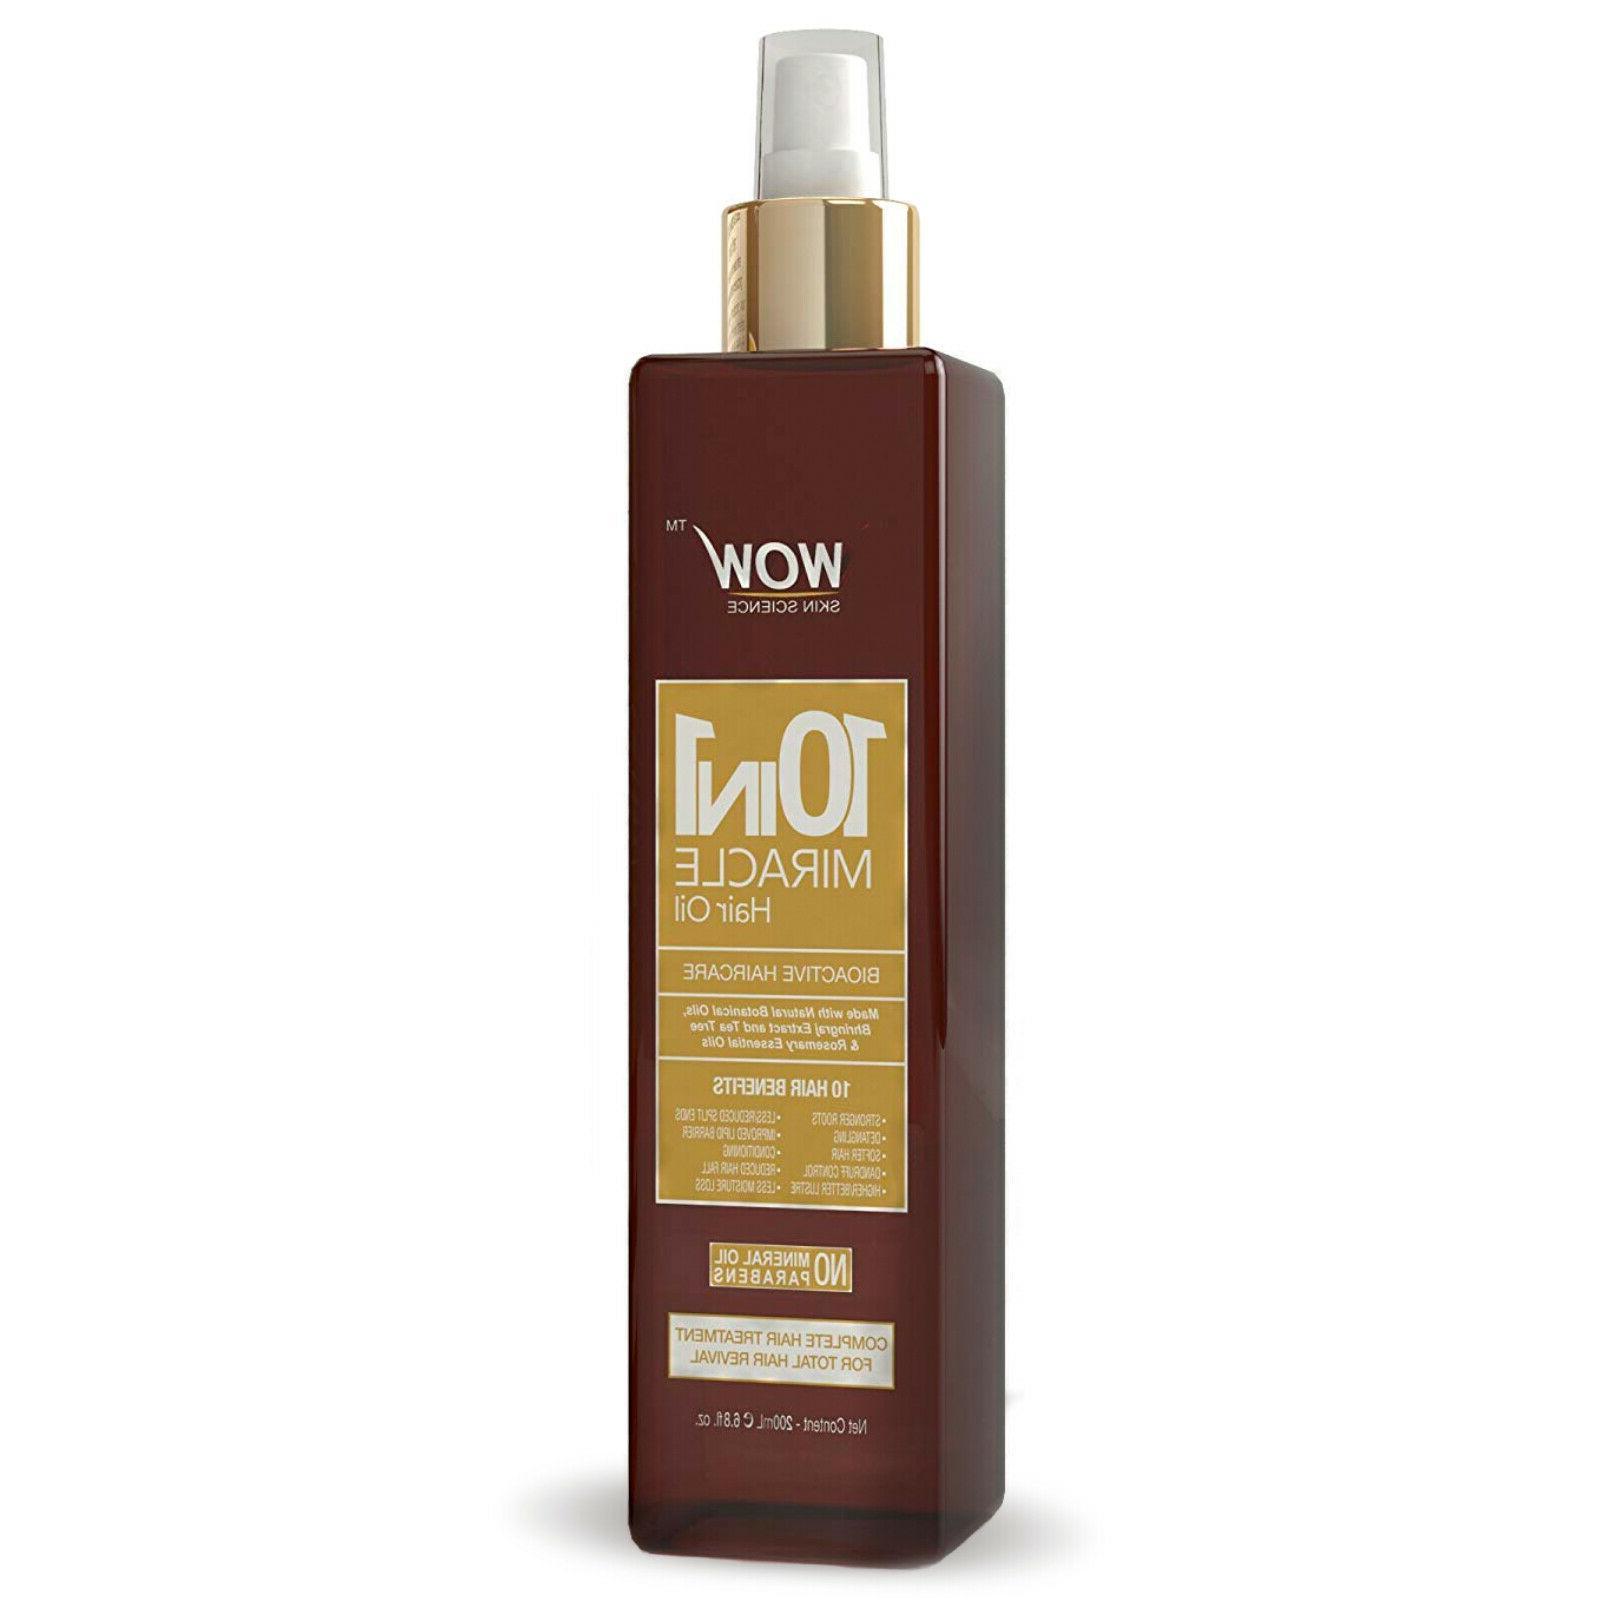 WOW Argan Oil Growth - With Almond Jojoba For